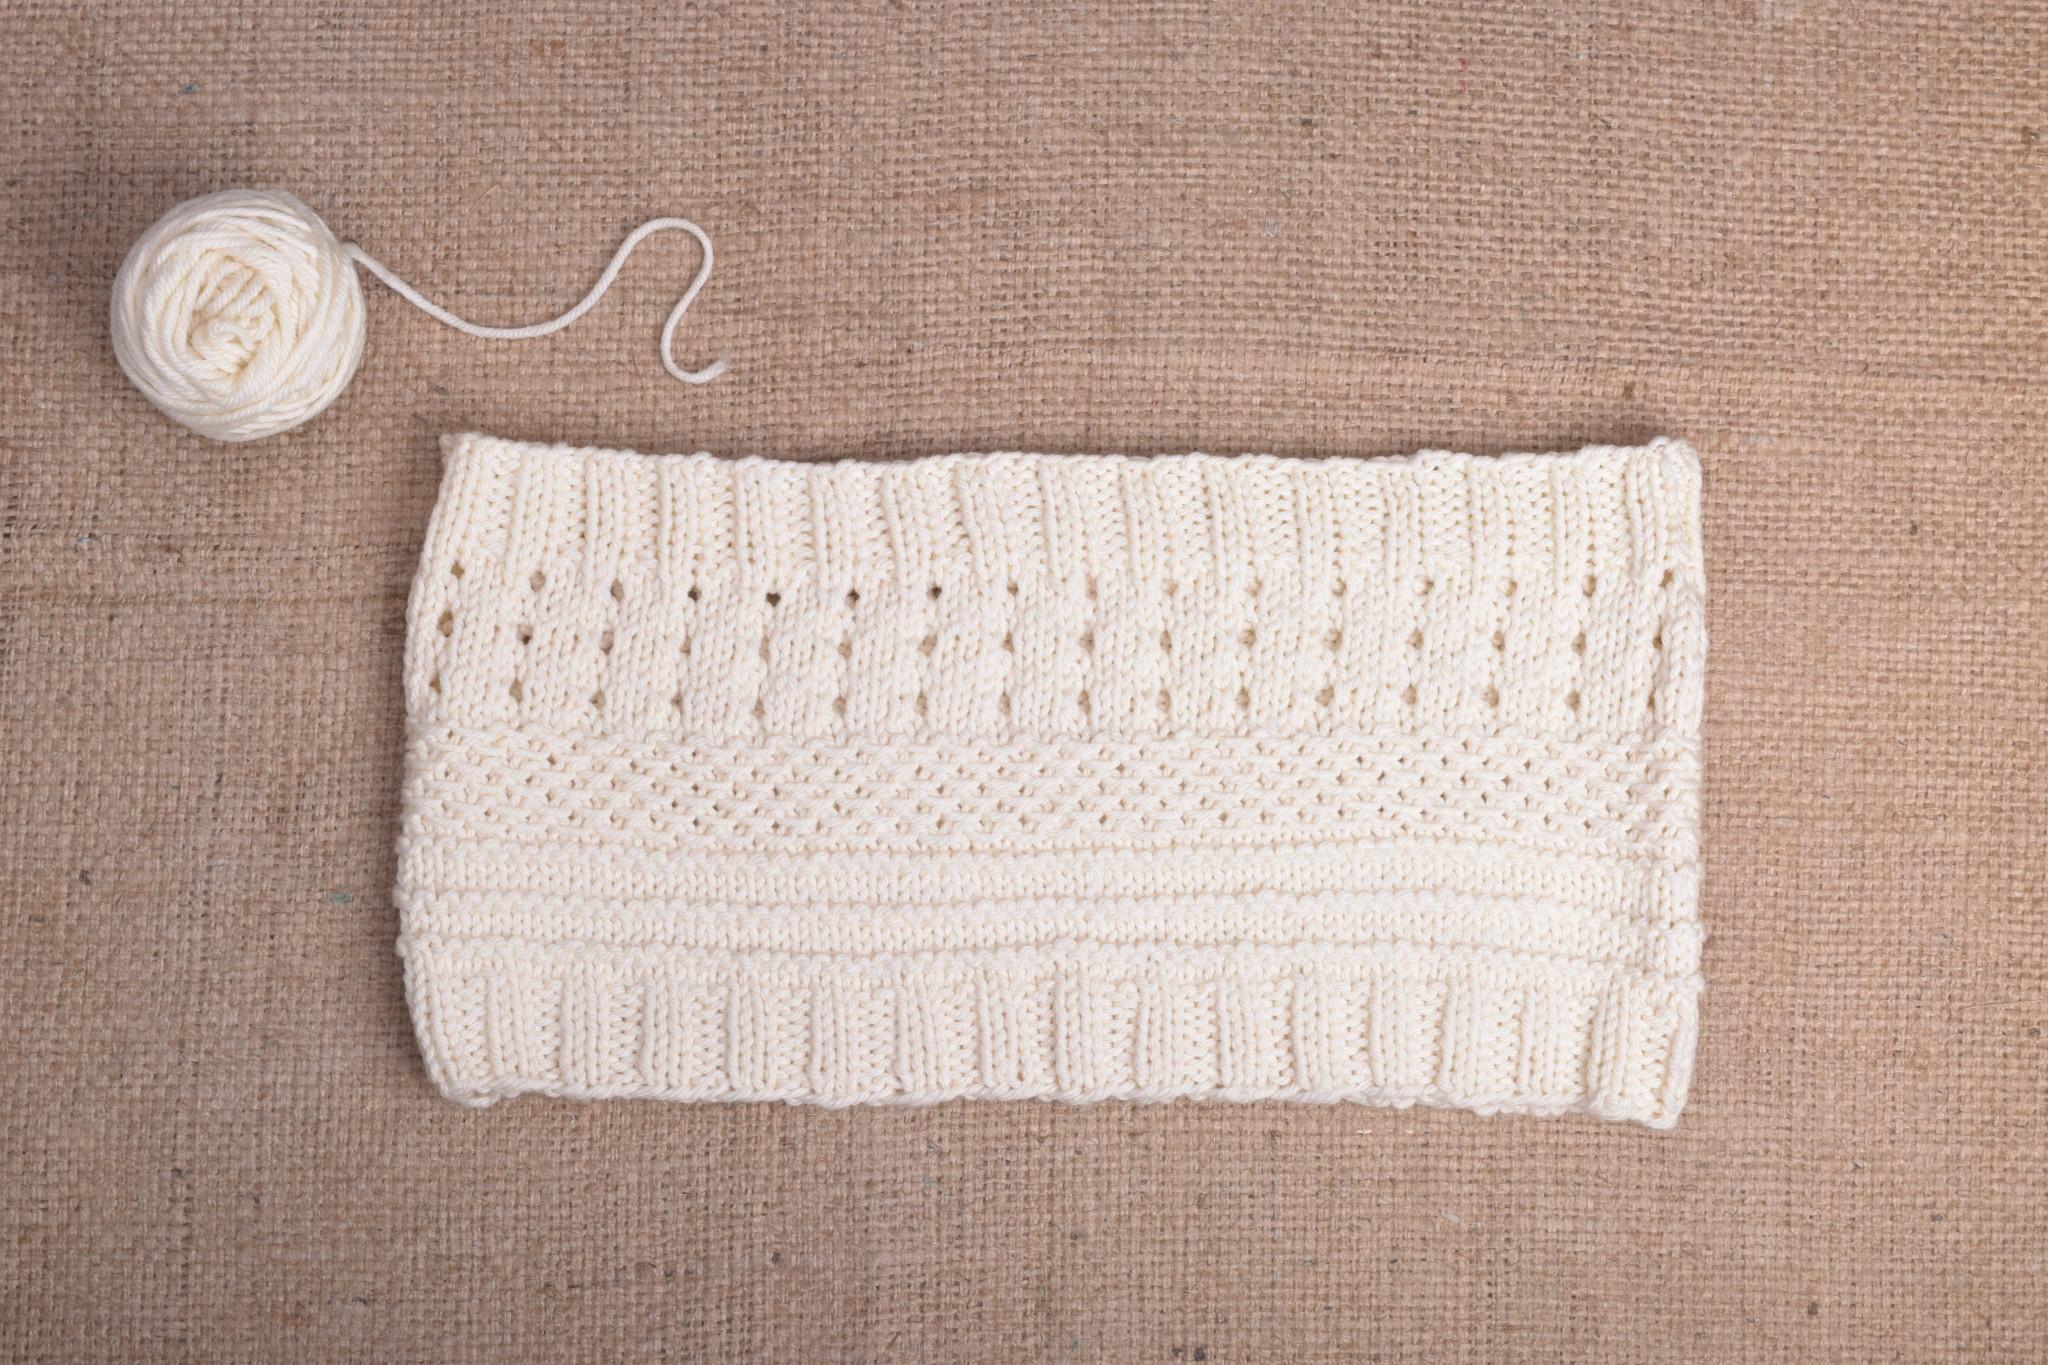 Knitting 101: Learn to Knit; Thursday, August 15, 22, 29, September 5;  6:00-8:00PM